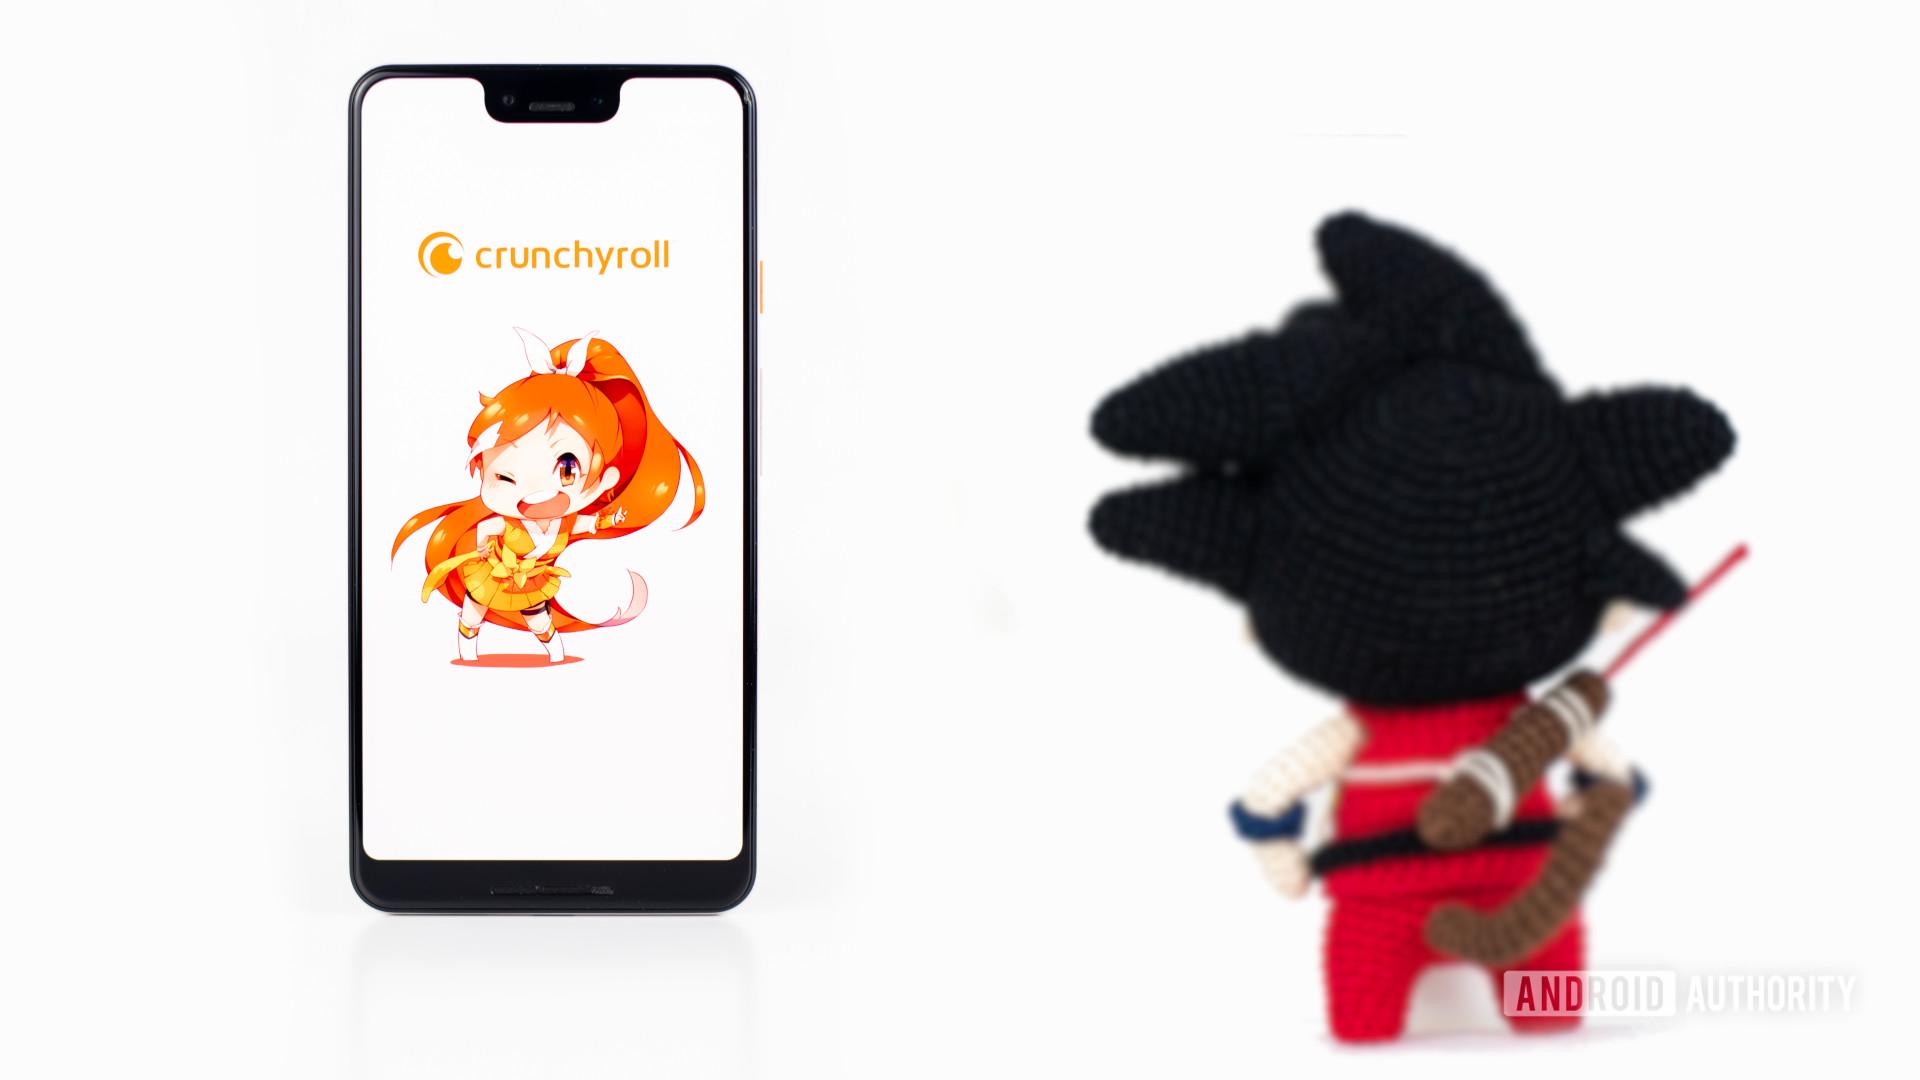 Crunchy Roll stock photo with Goku